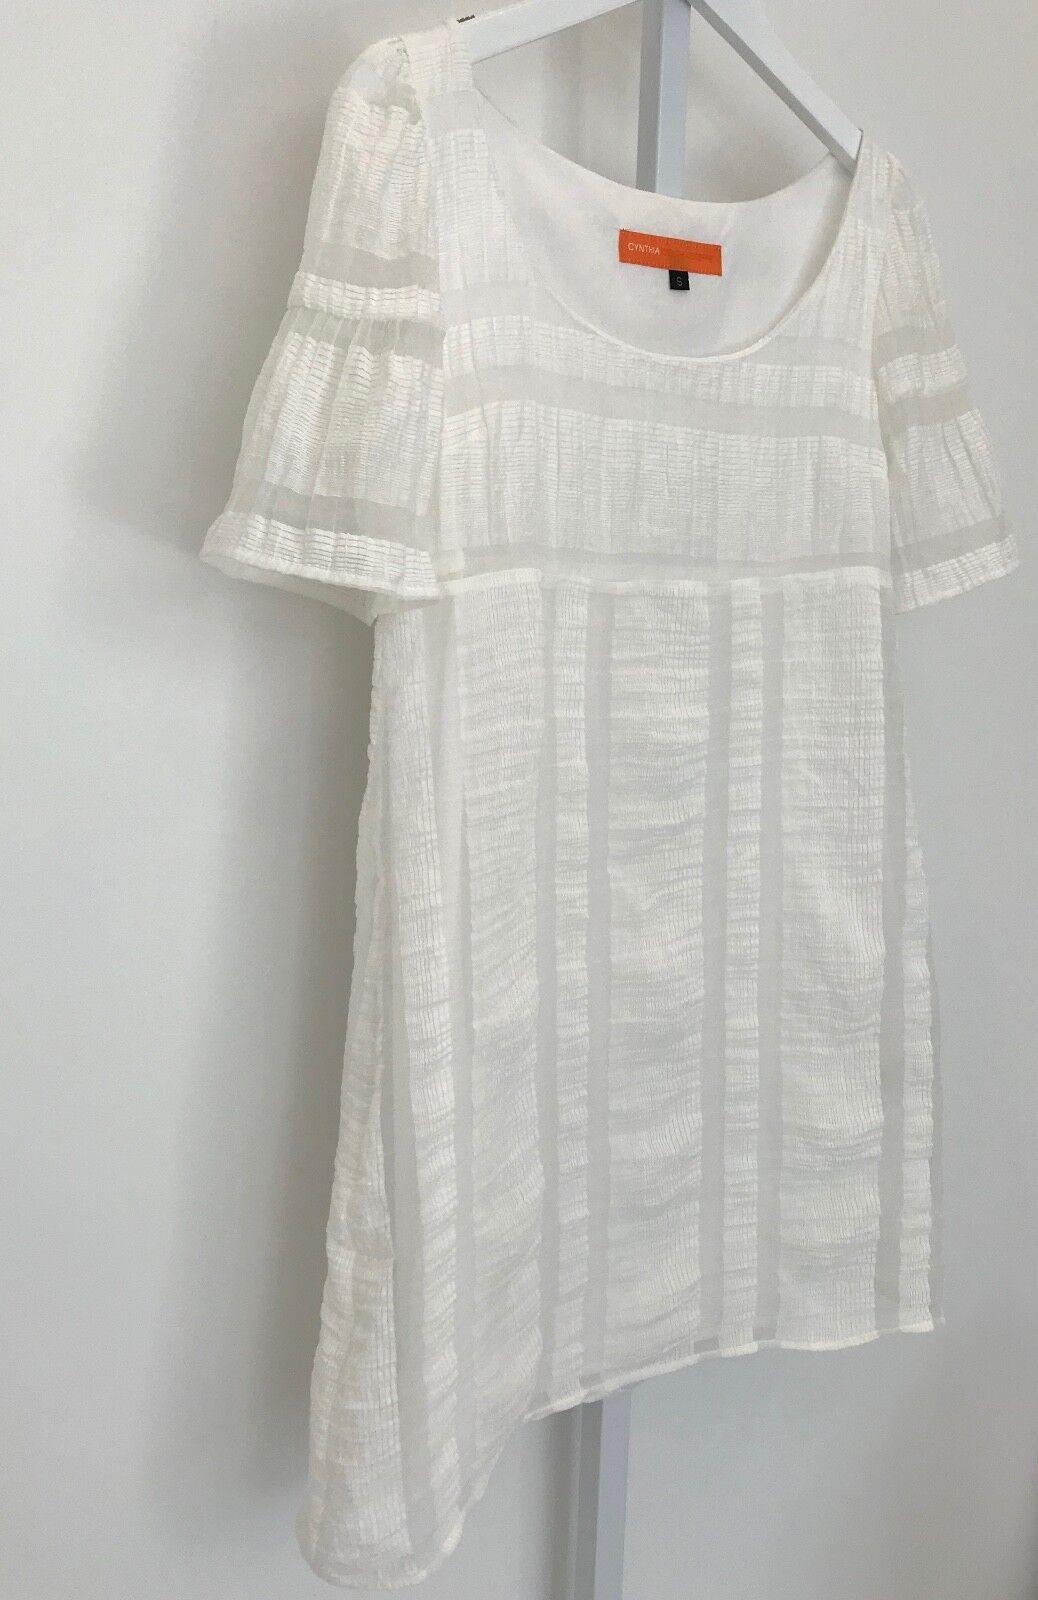 CYNTHIA CYNTHIA STEFFE WHITE LINEN NYLON VISCOSE SHIFT DRESS 83389121 SIZE SMALL